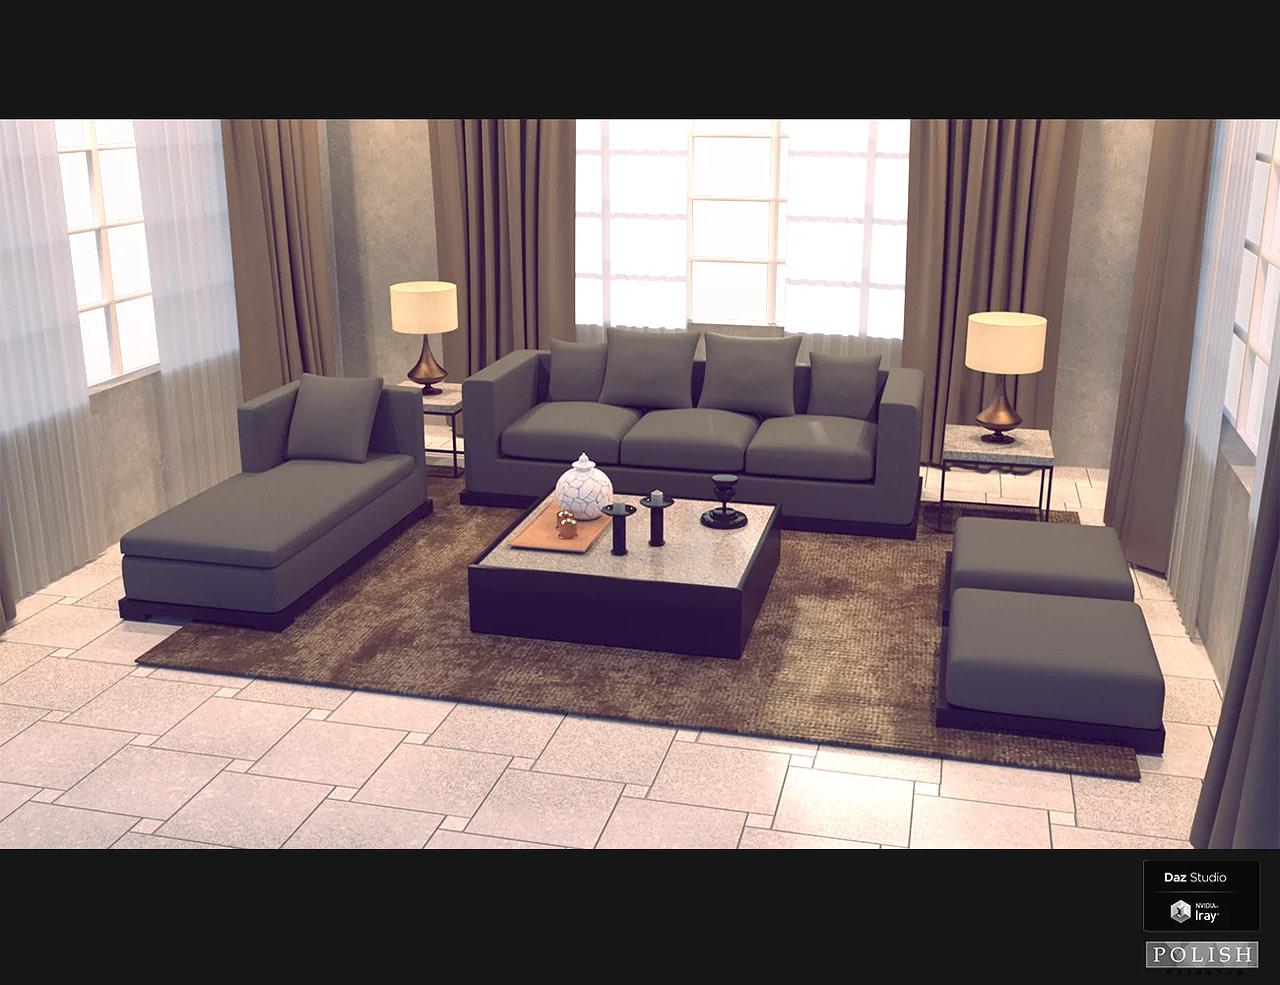 daz interior furniture bundle